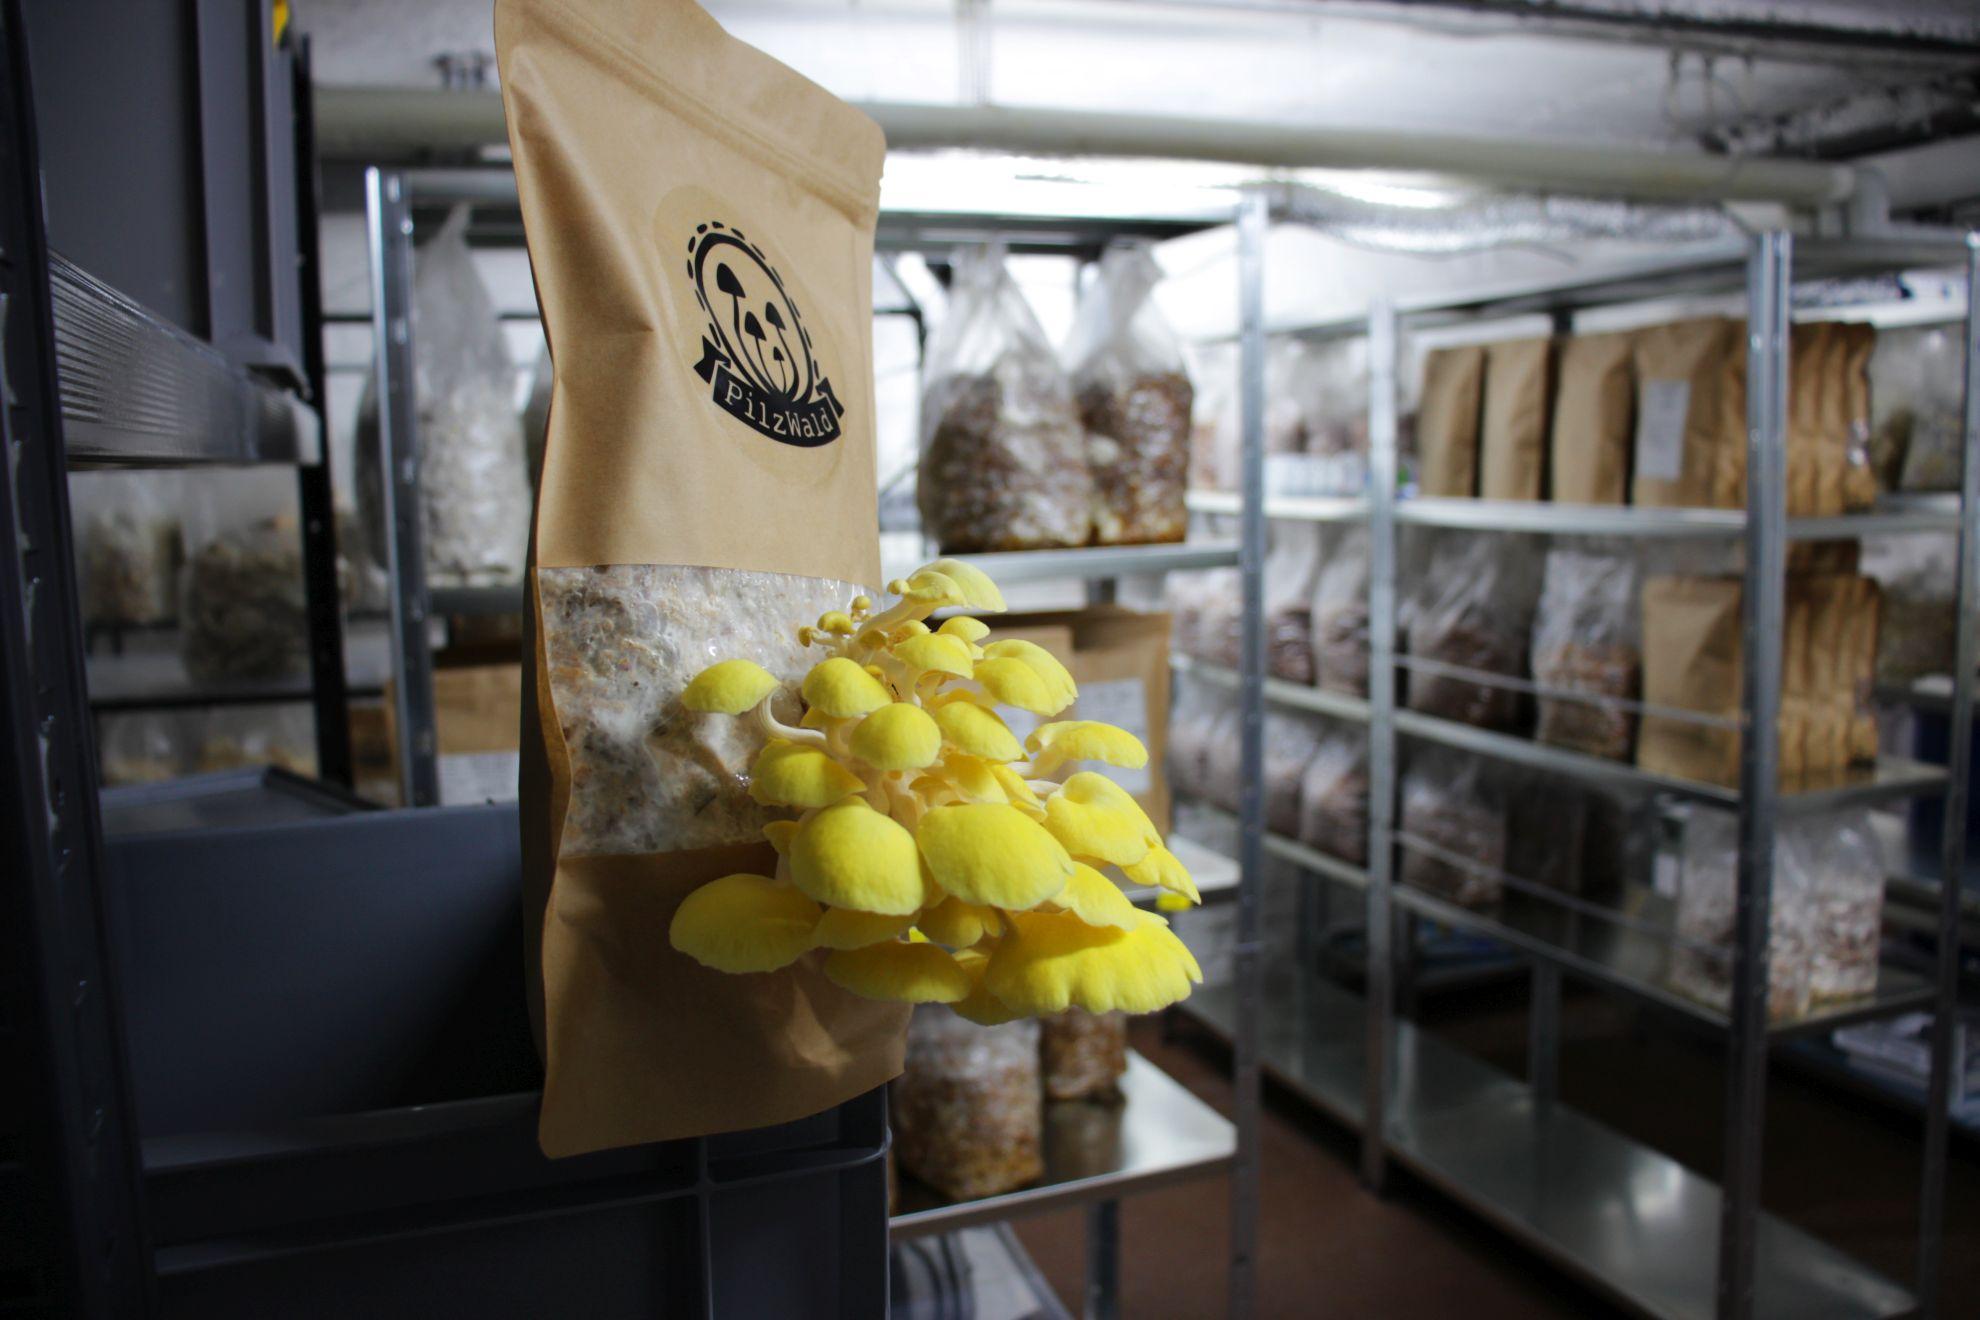 Die PilzBox ist ein Produkt der Kölner Pilzmanufaktur. (Foto: PilzWald Pilzmanufaktur)